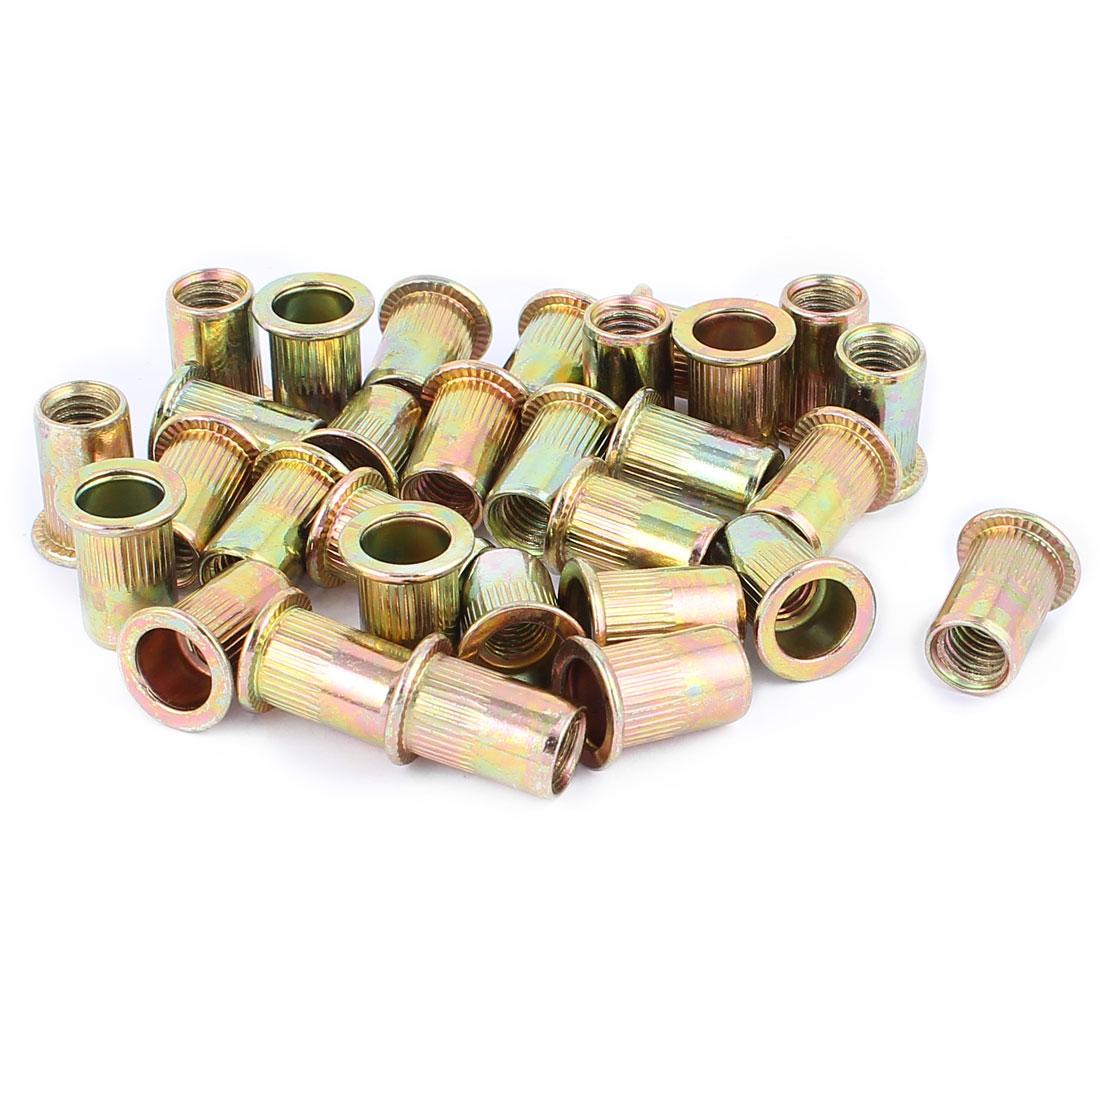 30 Pcs M8x18 Carbon Steel Rivet Nut Insert Nutsert